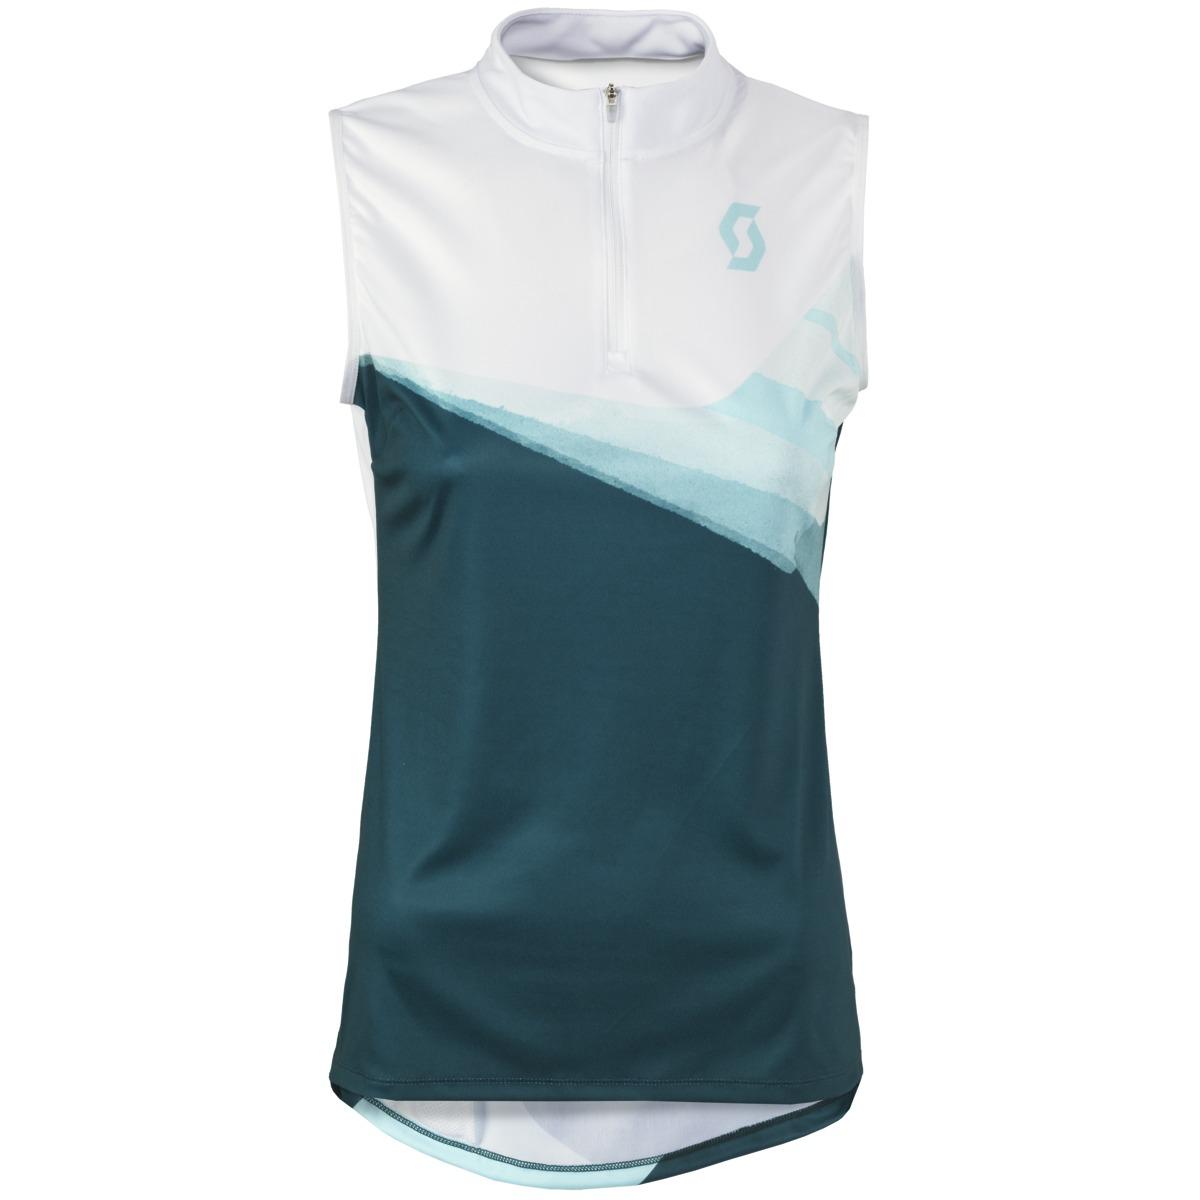 Scott-Shirt-Sky-20-Fahrrad-Trikot-Damen-Armellos-und-atmungsaktiv